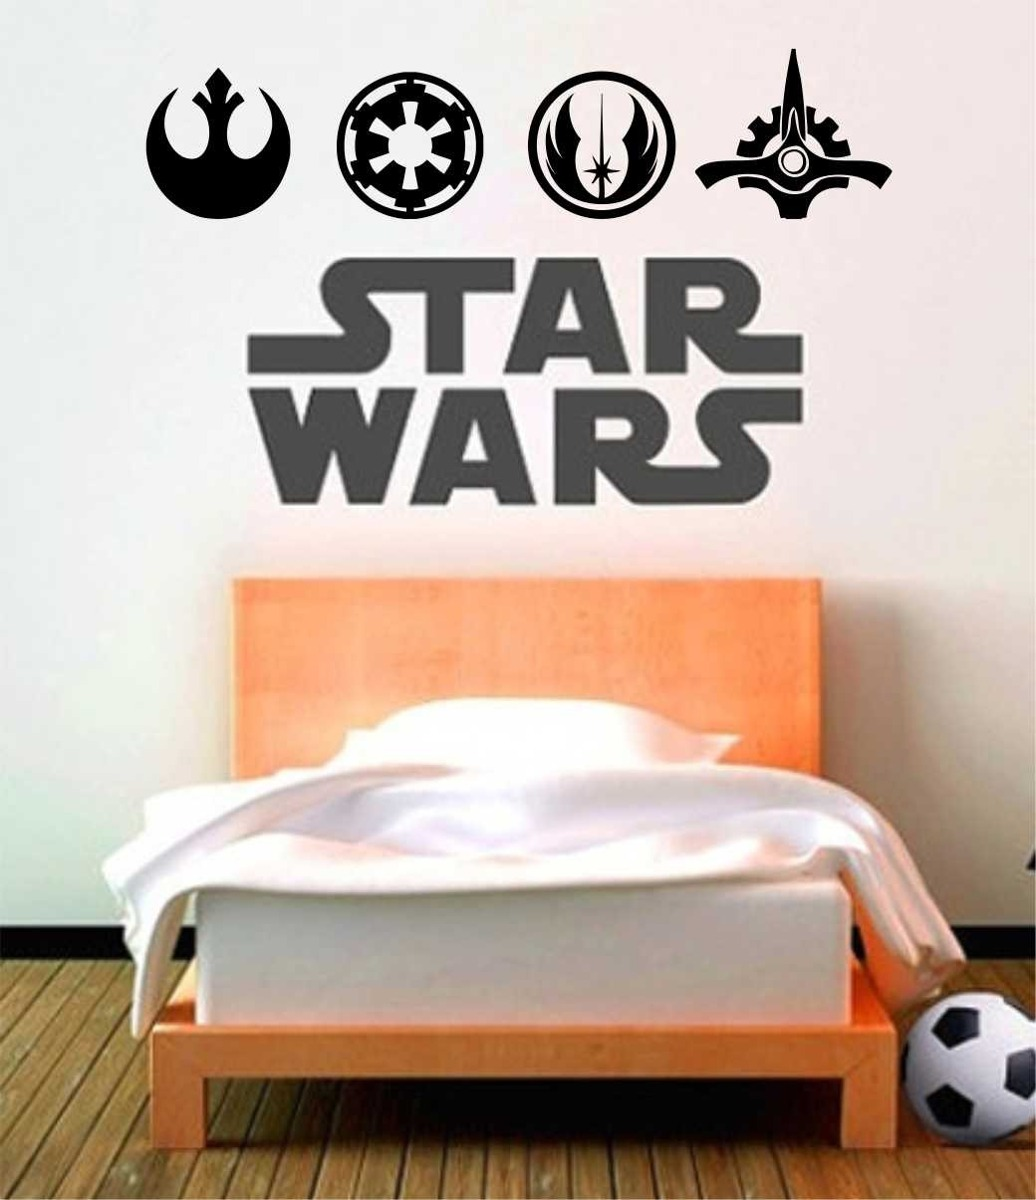 Adesivo De Porta Star Wars ~ Adesivo De Parede Star Wars Dartwader Jedy Guerra R$ 79,90 em Mercado Livre